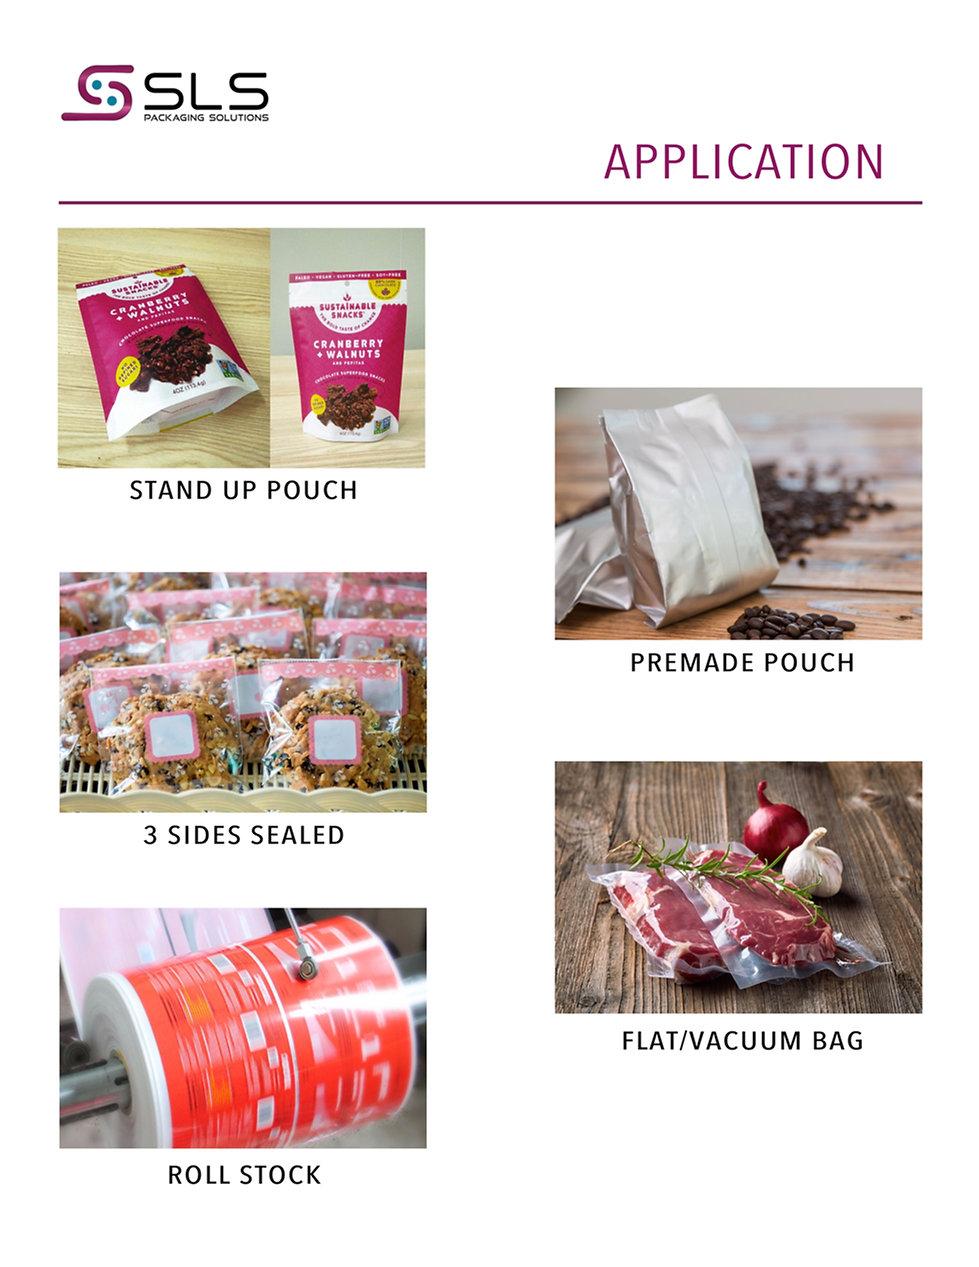 SLS-Packaging-Solutions-brochure-final-2